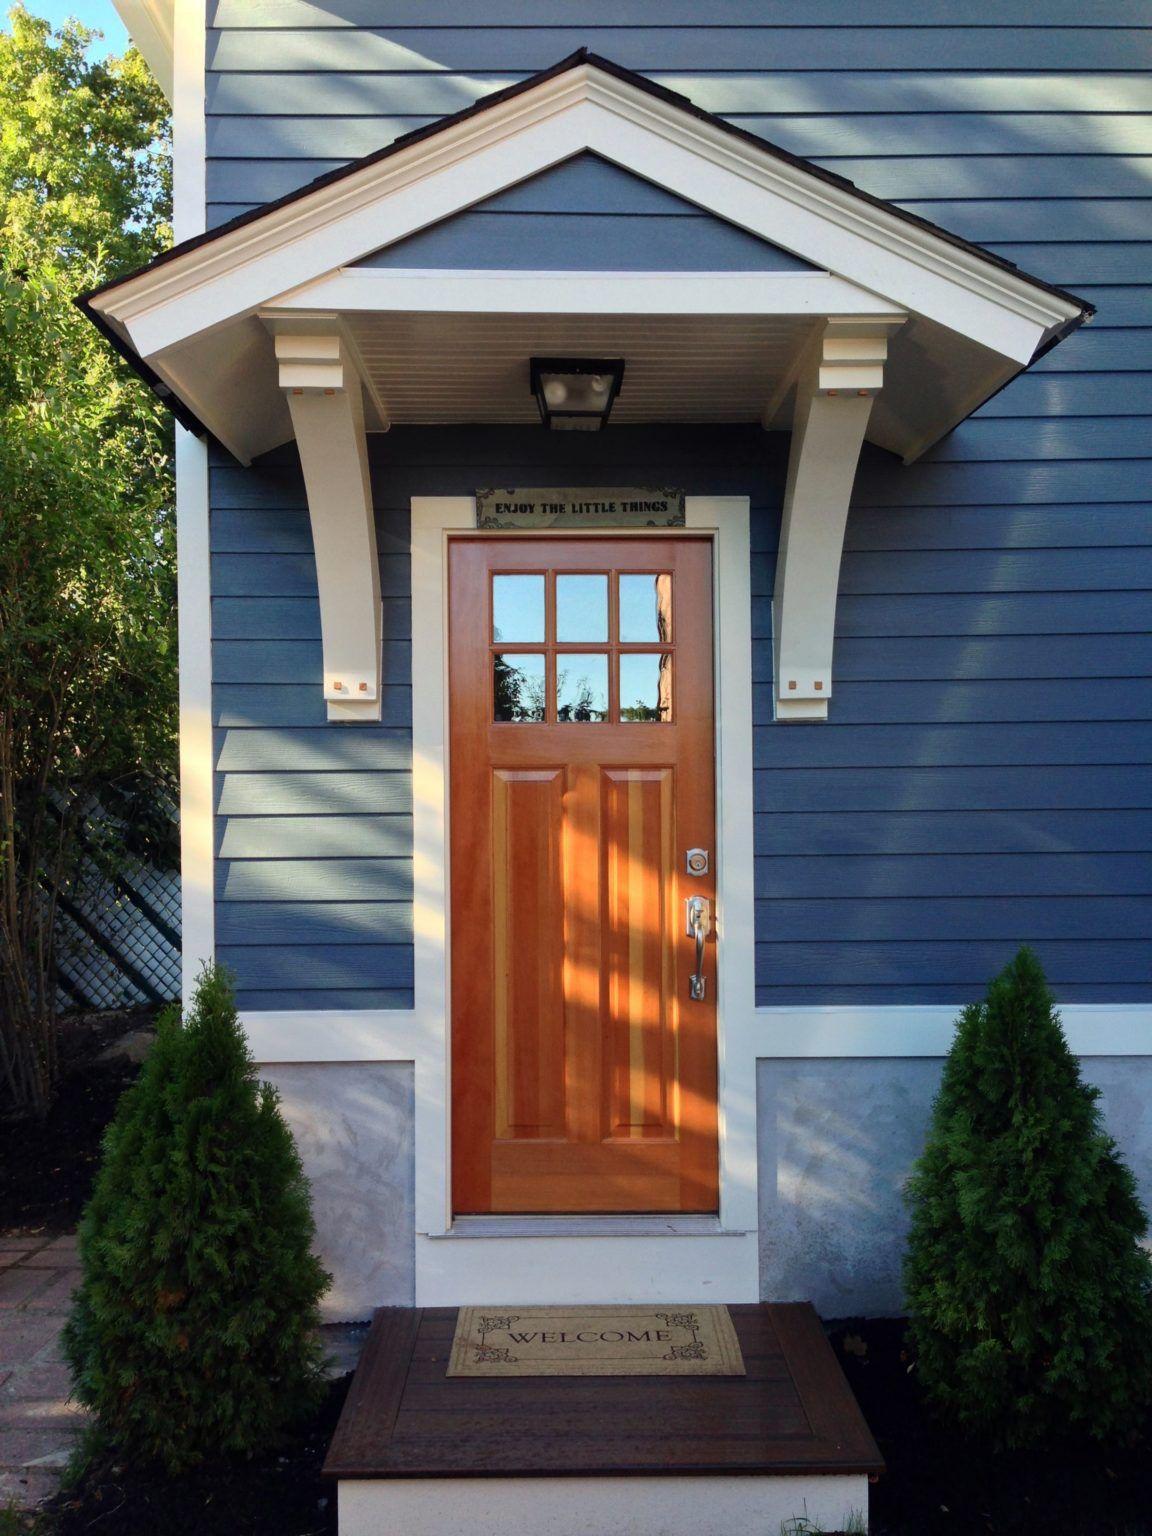 7 Beautiful Door Overhang Designs Ideas To Make Your Home Elegant Moetoe In 2020 Porch Design Front Porch Design Farmhouse Doors